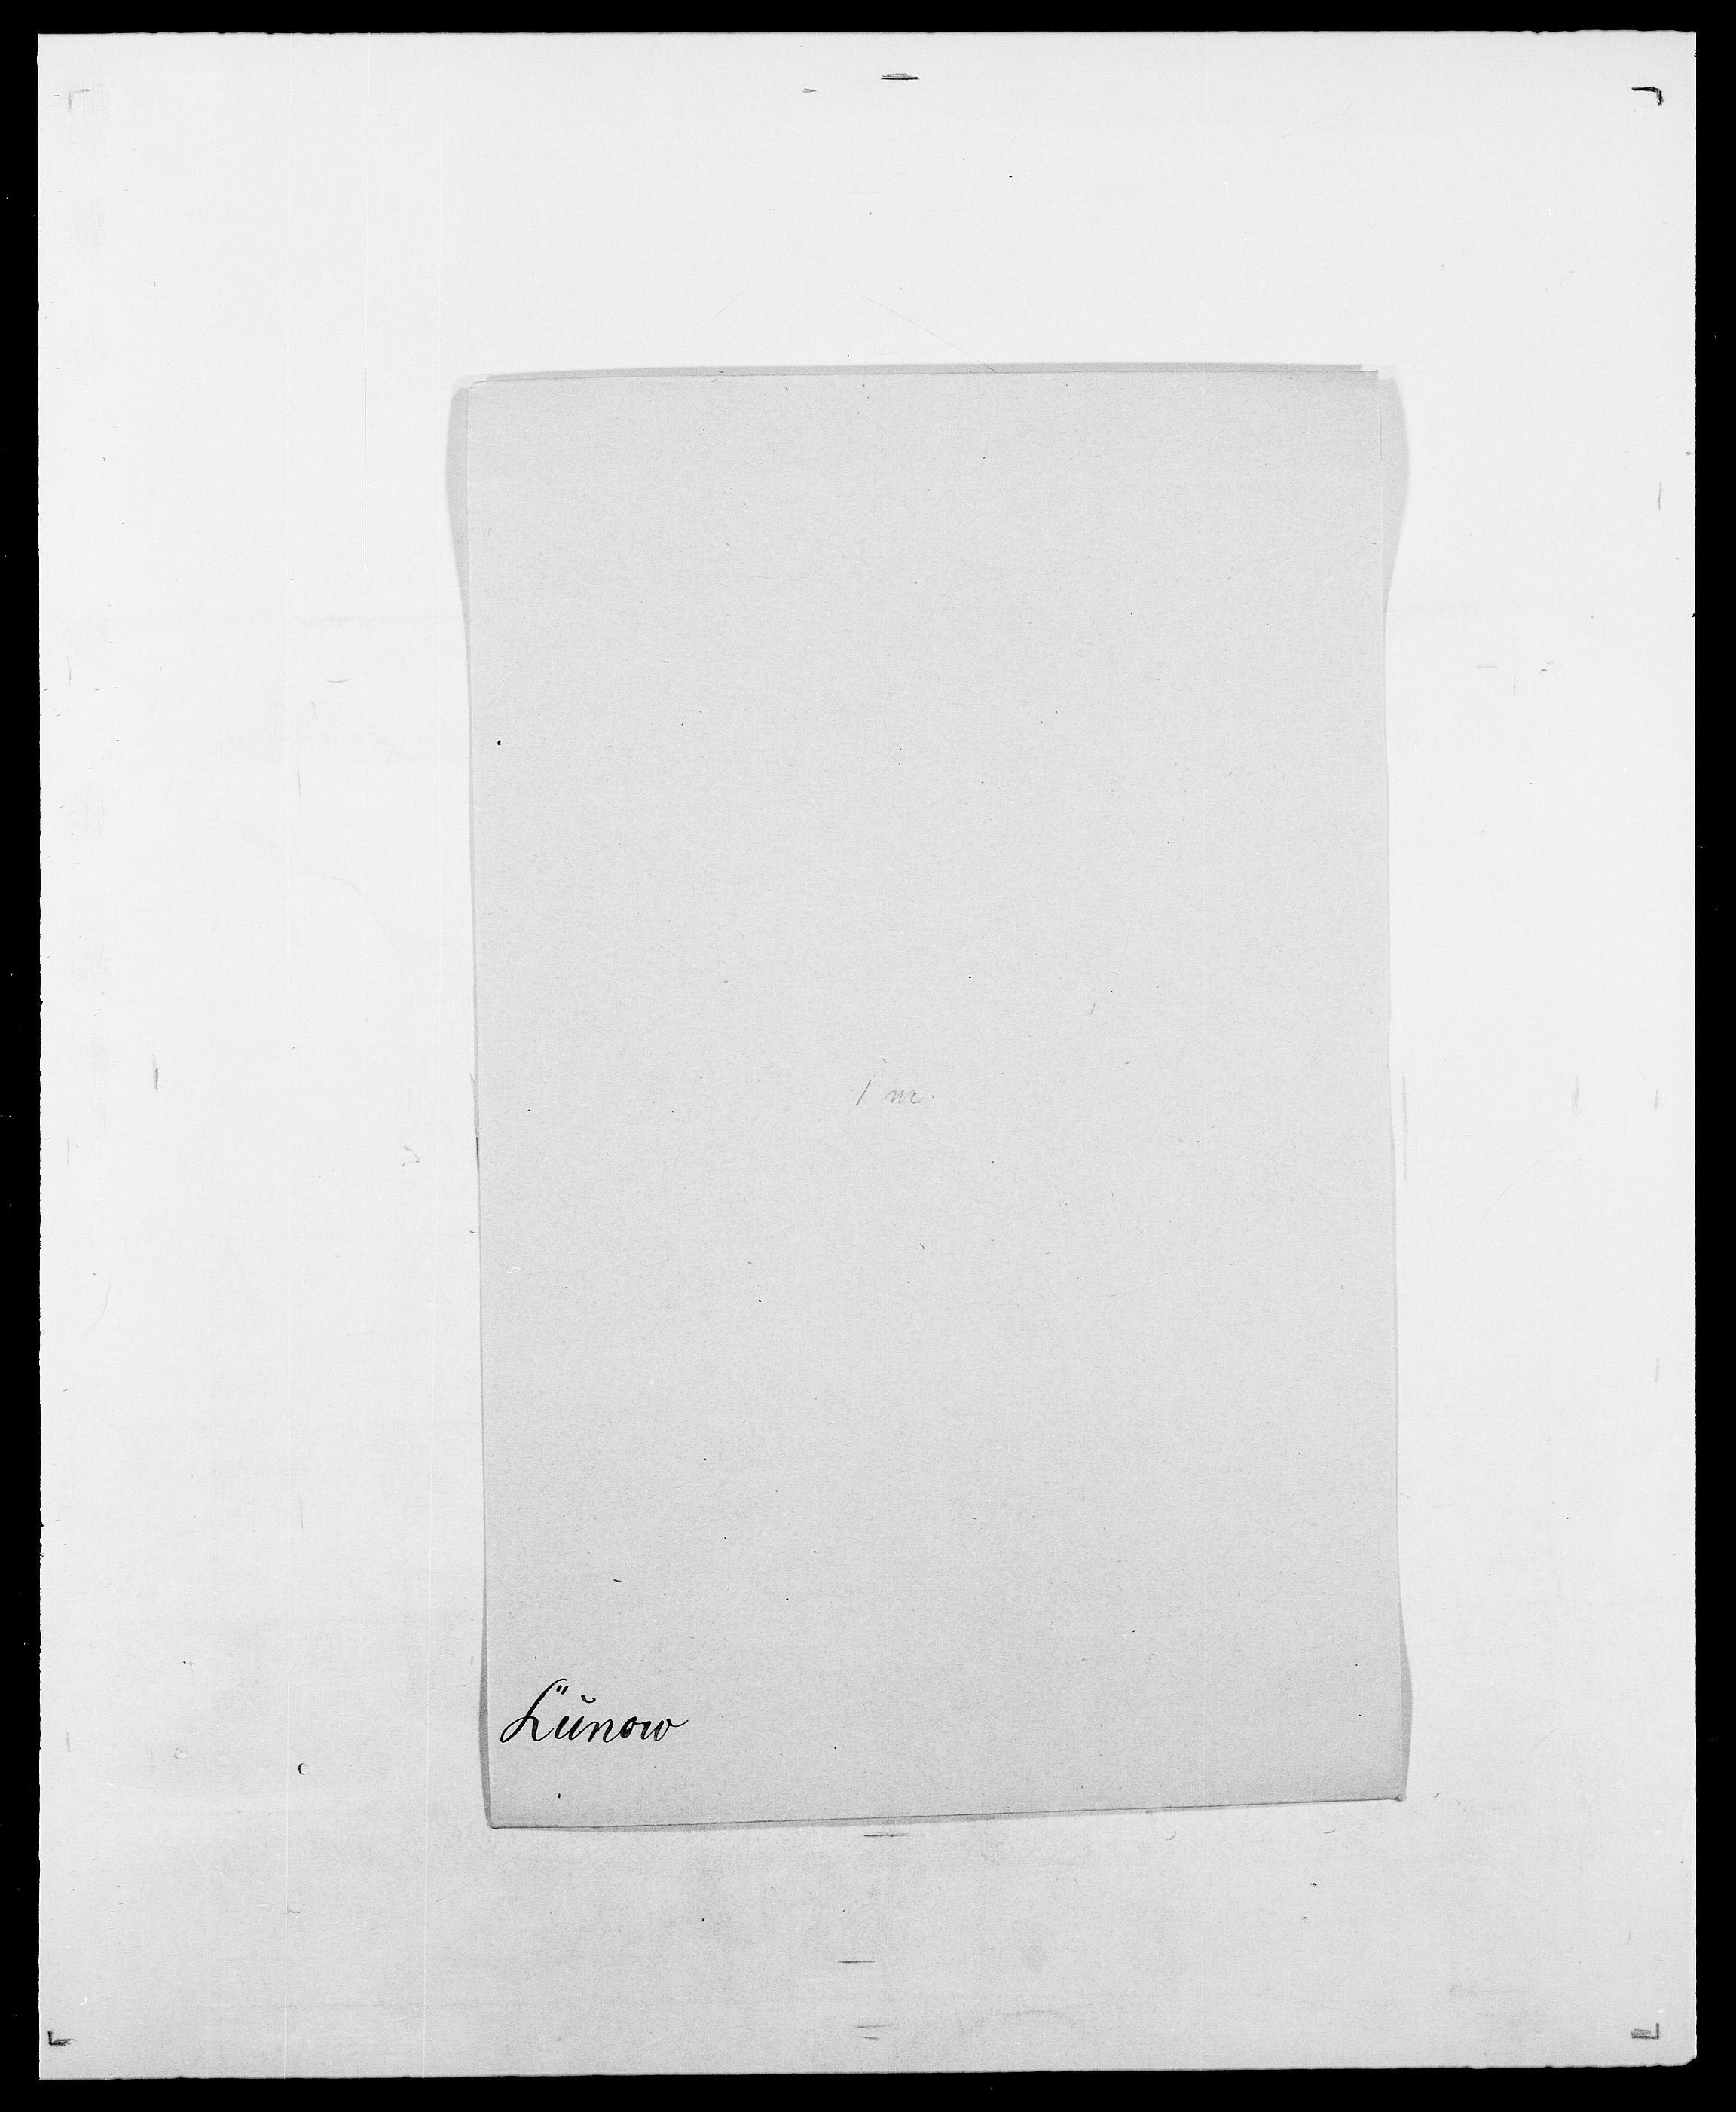 SAO, Delgobe, Charles Antoine - samling, D/Da/L0024: Lobech - Lærum, s. 653